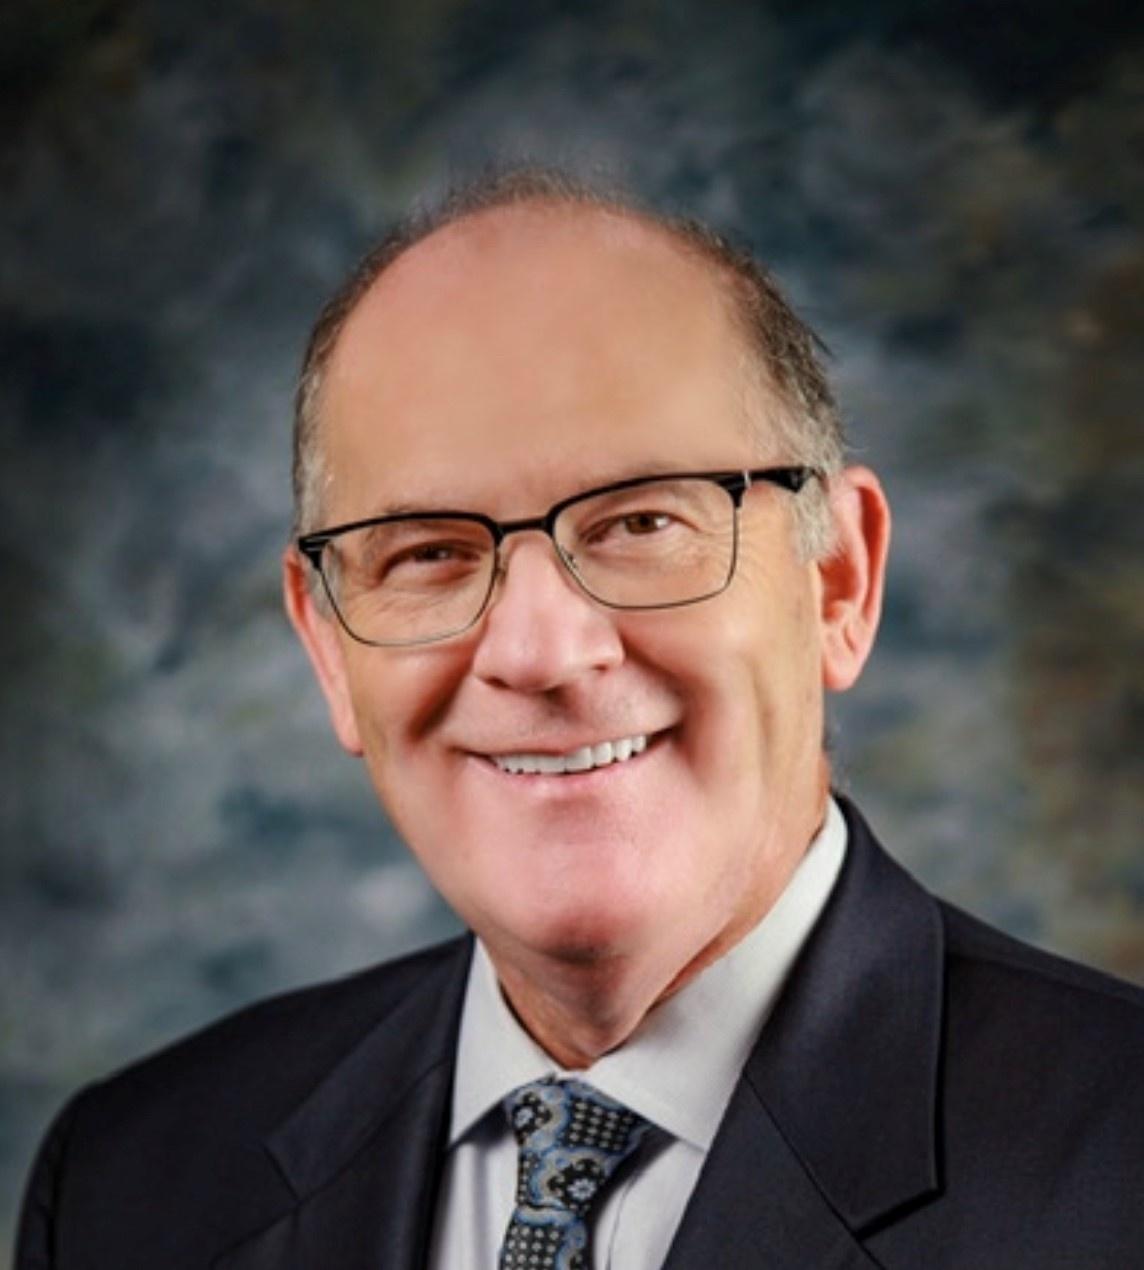 Dr. Tom Hartsock